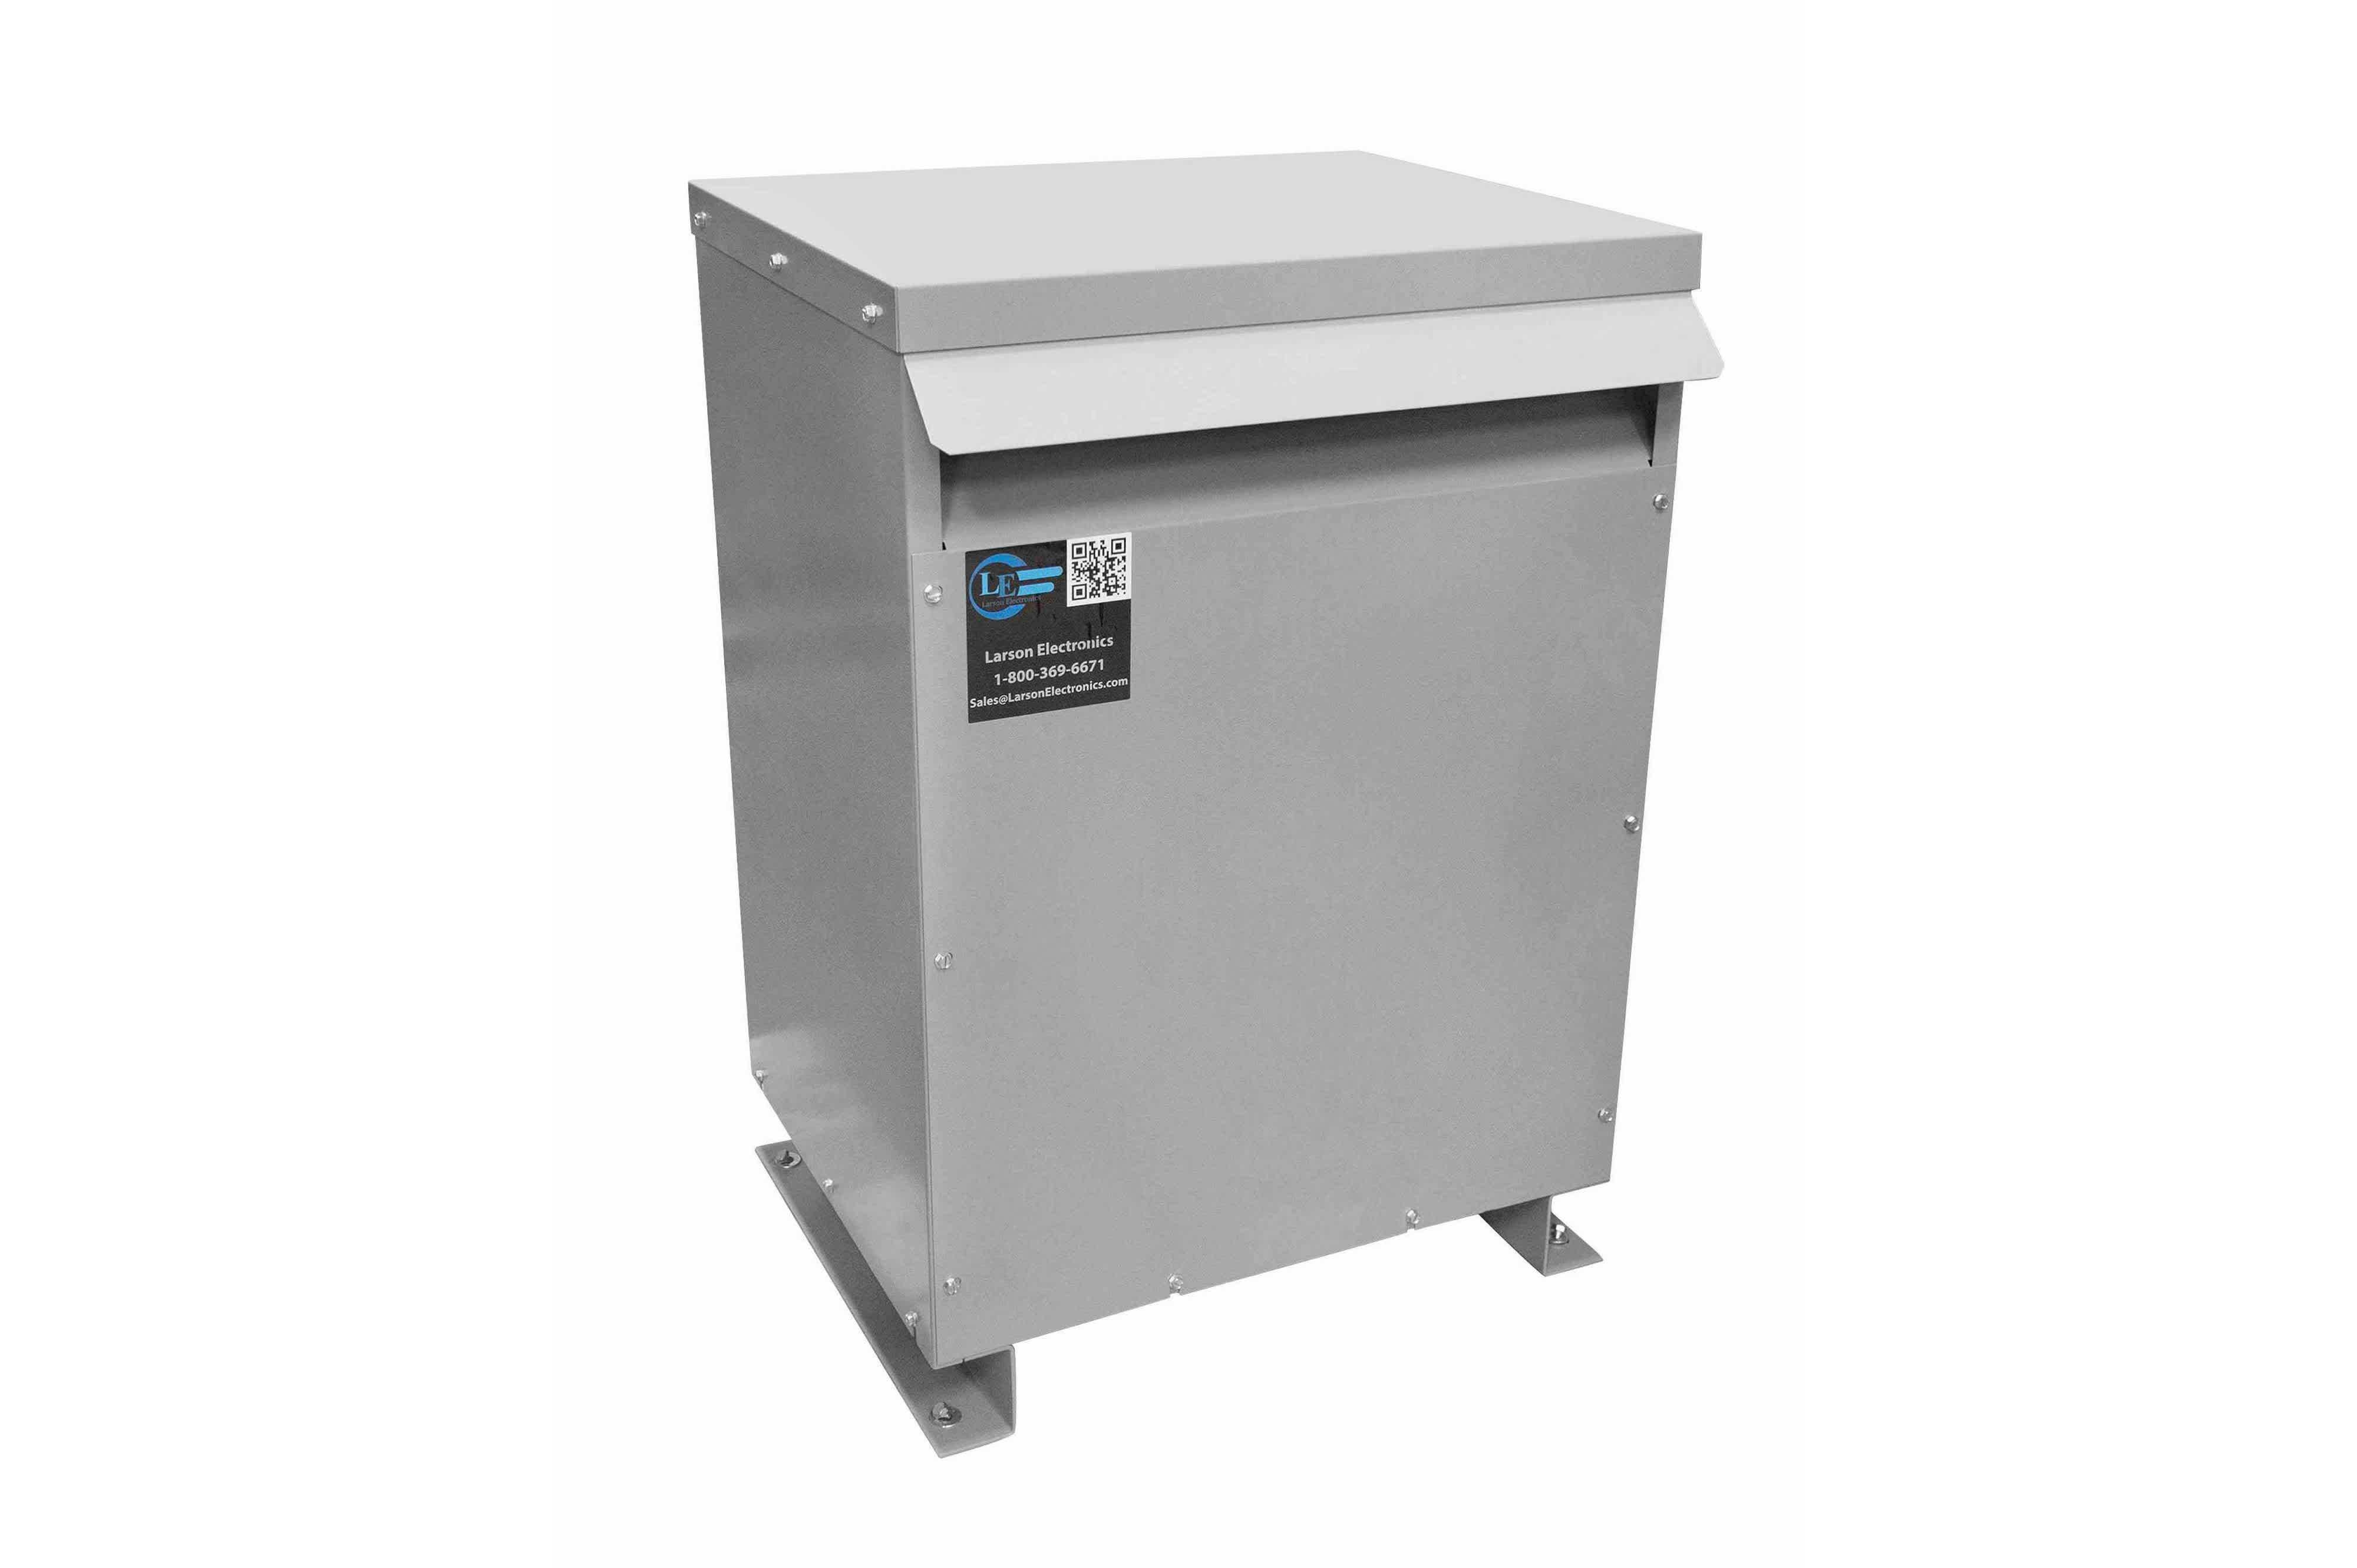 70 kVA 3PH Isolation Transformer, 460V Wye Primary, 400V Delta Secondary, N3R, Ventilated, 60 Hz